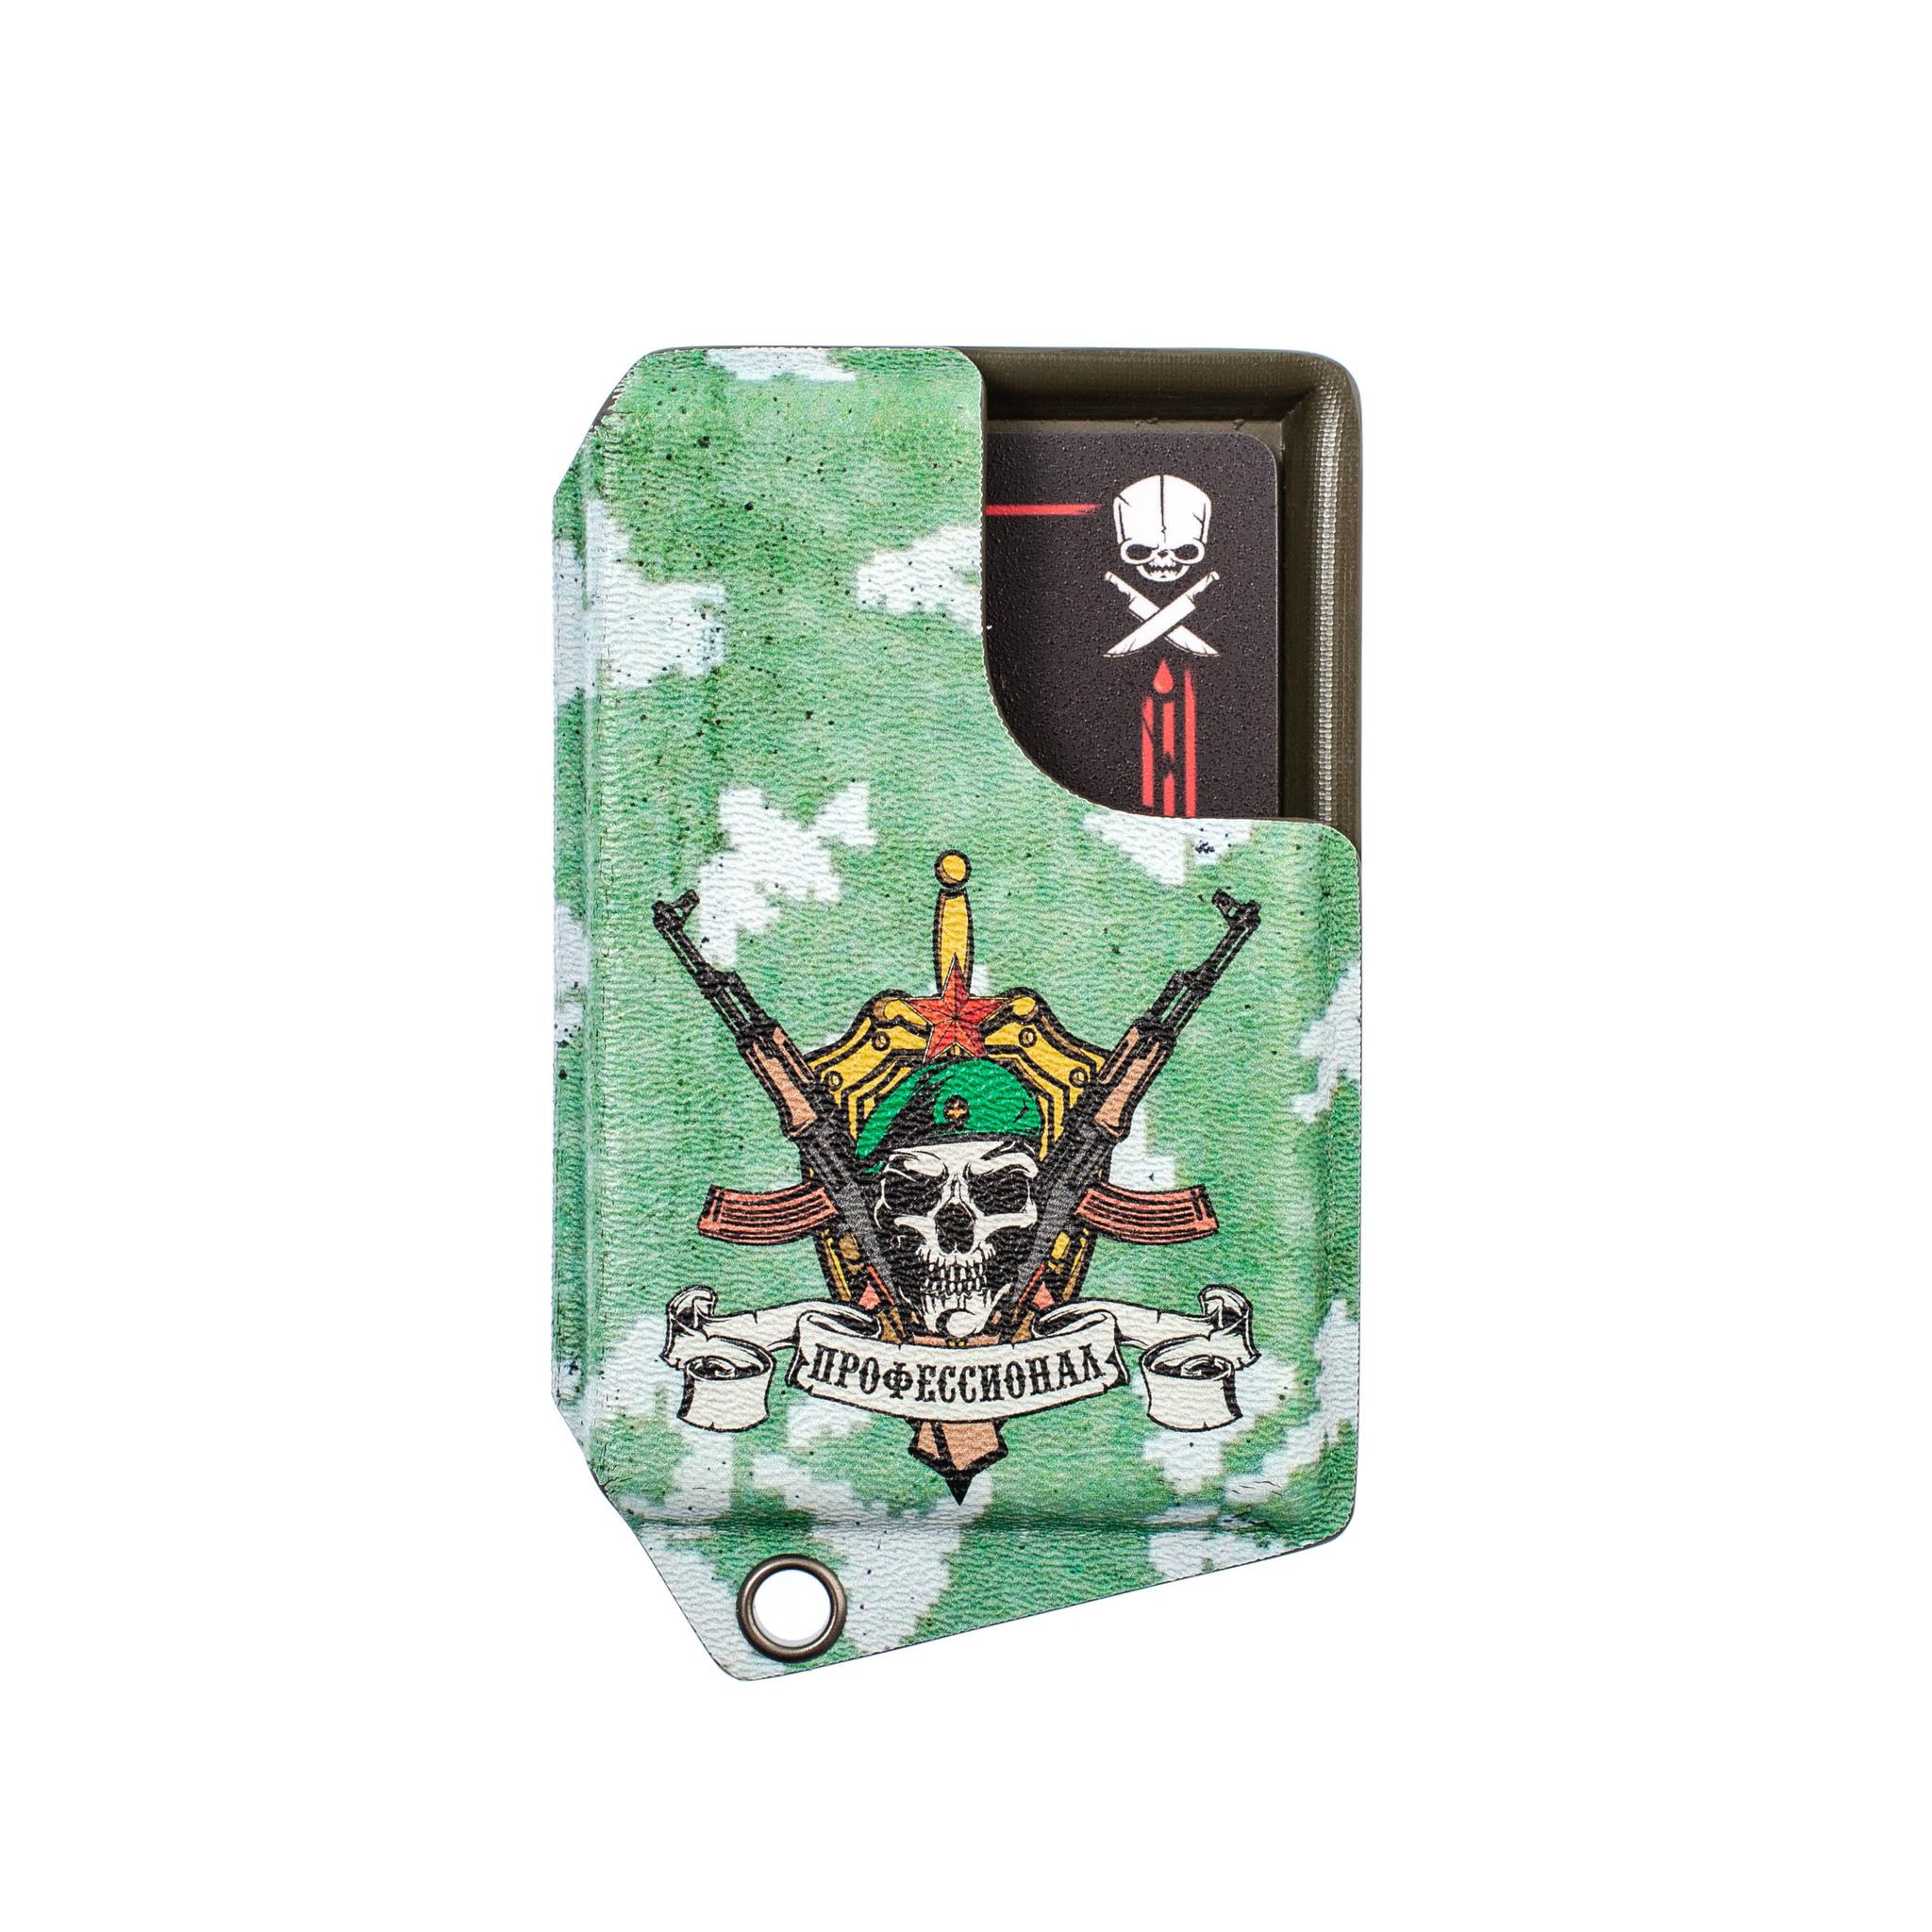 Кардхолдер Pirate Custom ВДВ